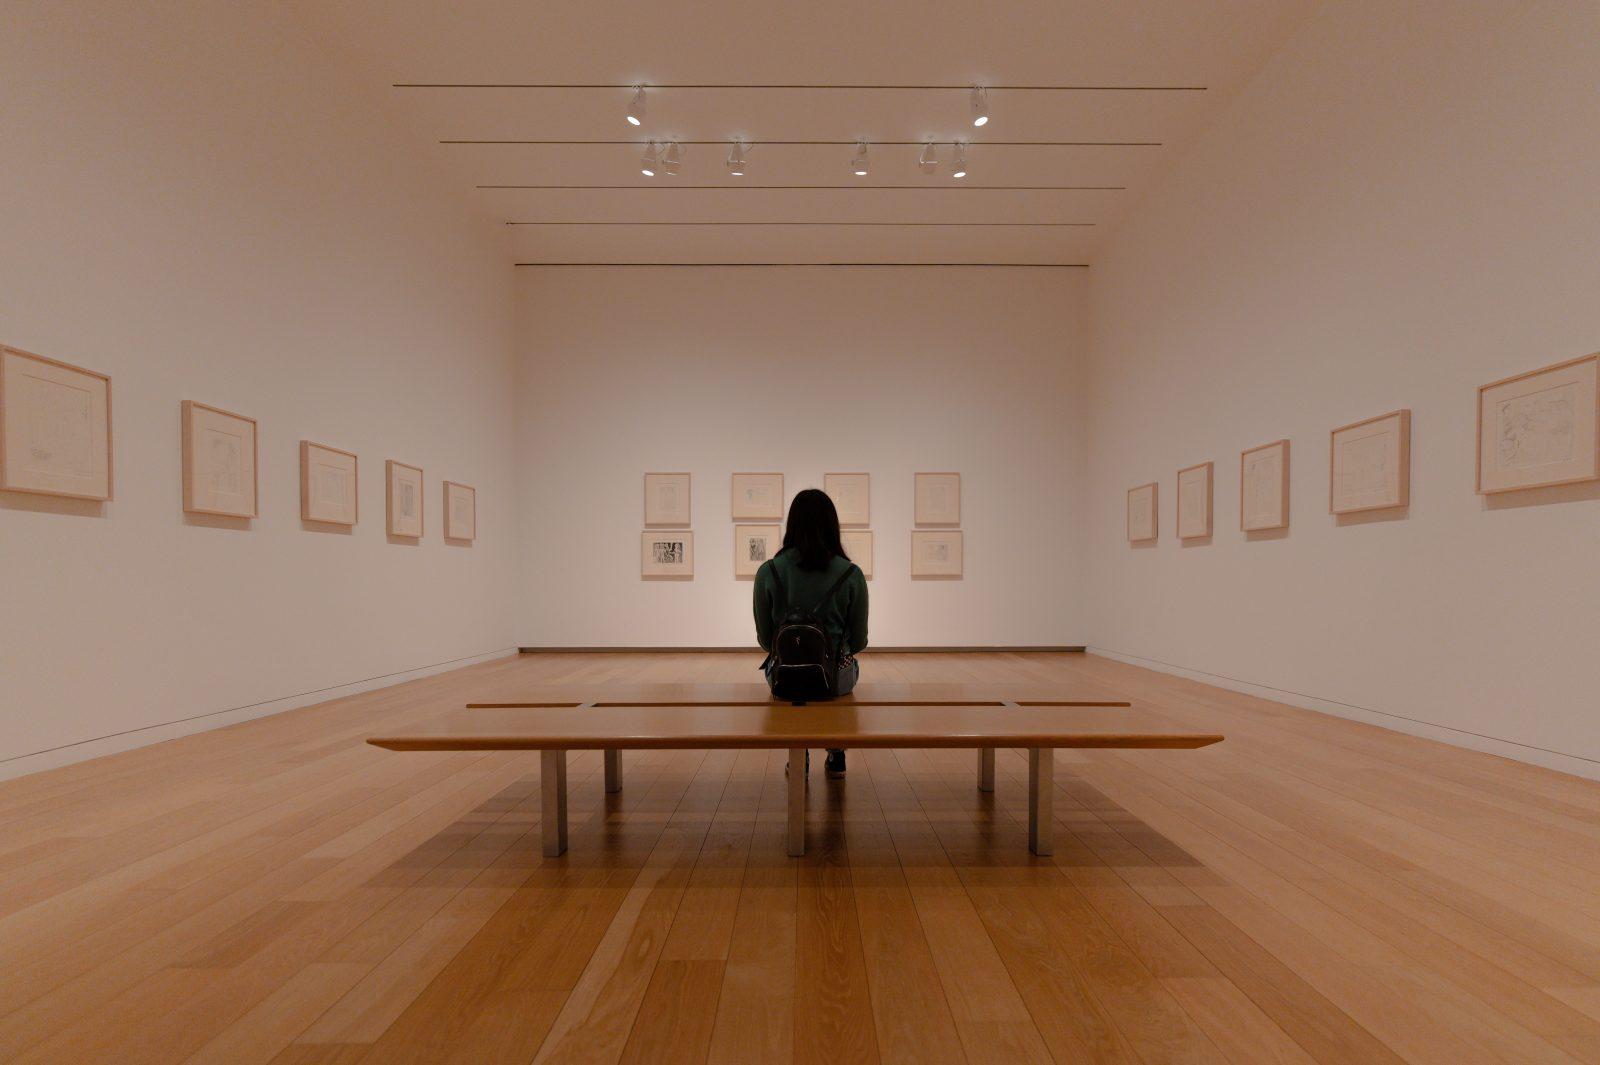 Harding Art Show: Woman sitting in an art gallery